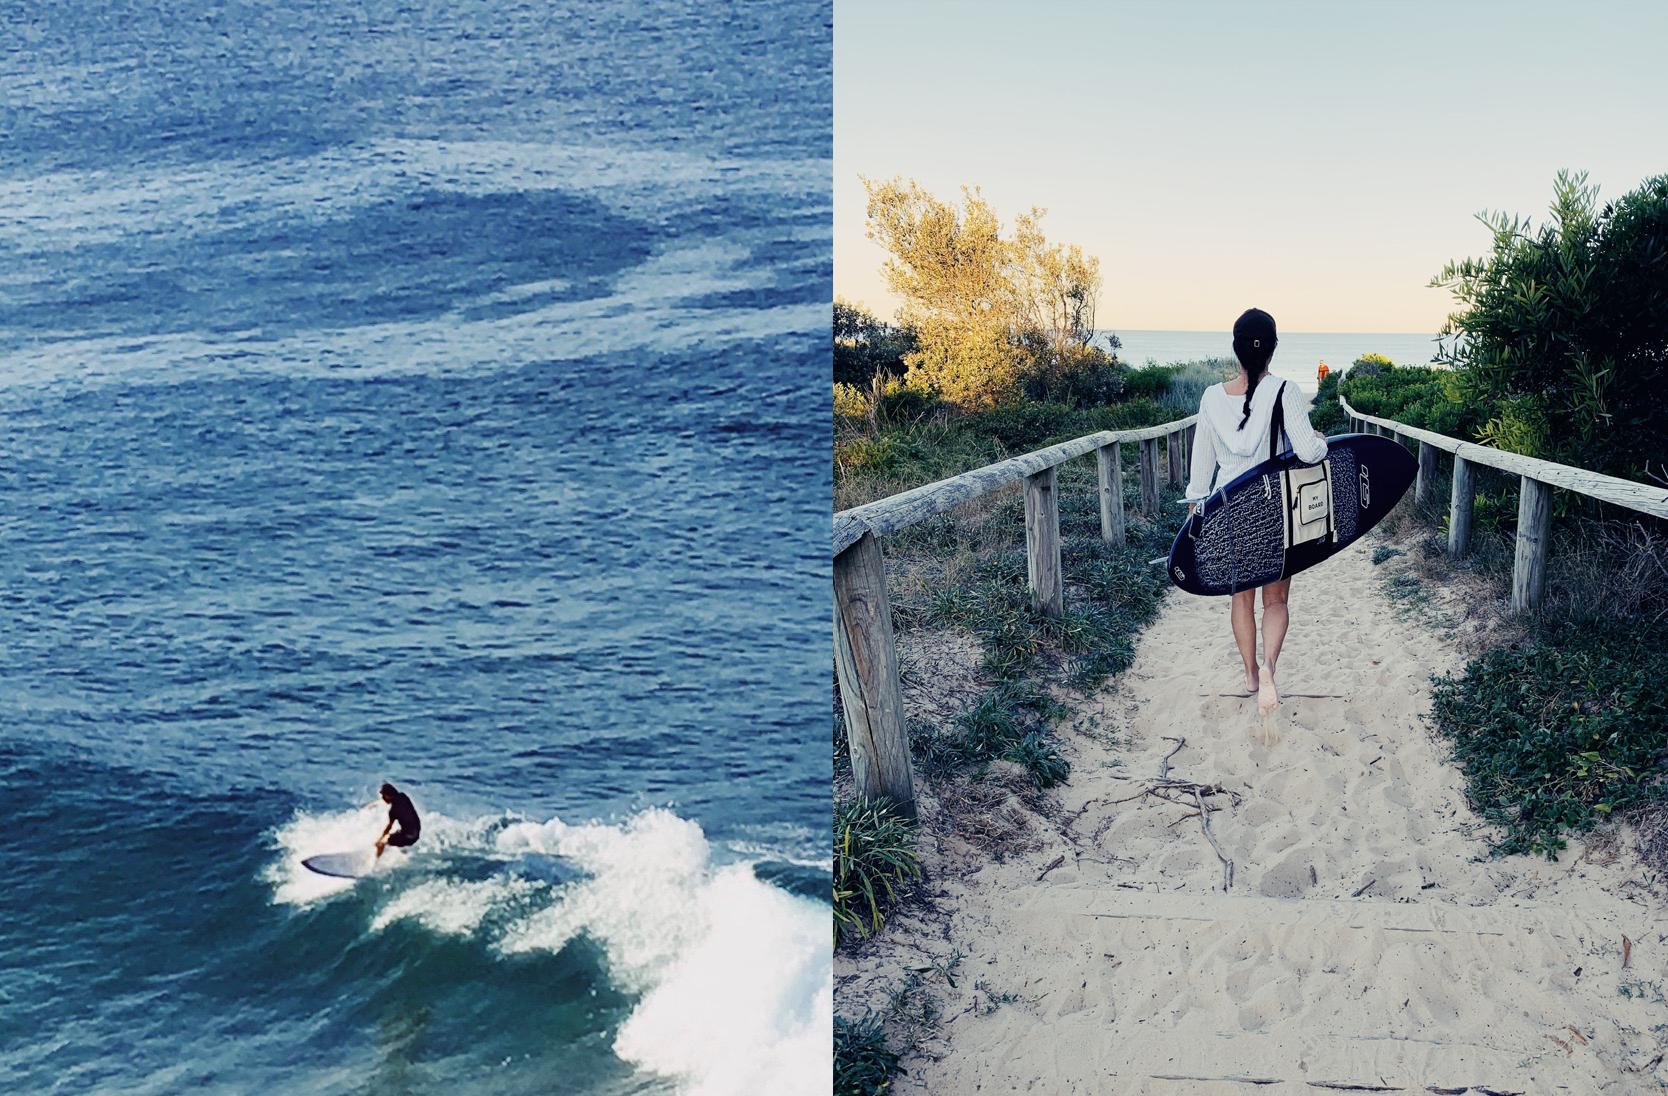 Surfboard wave.jpg